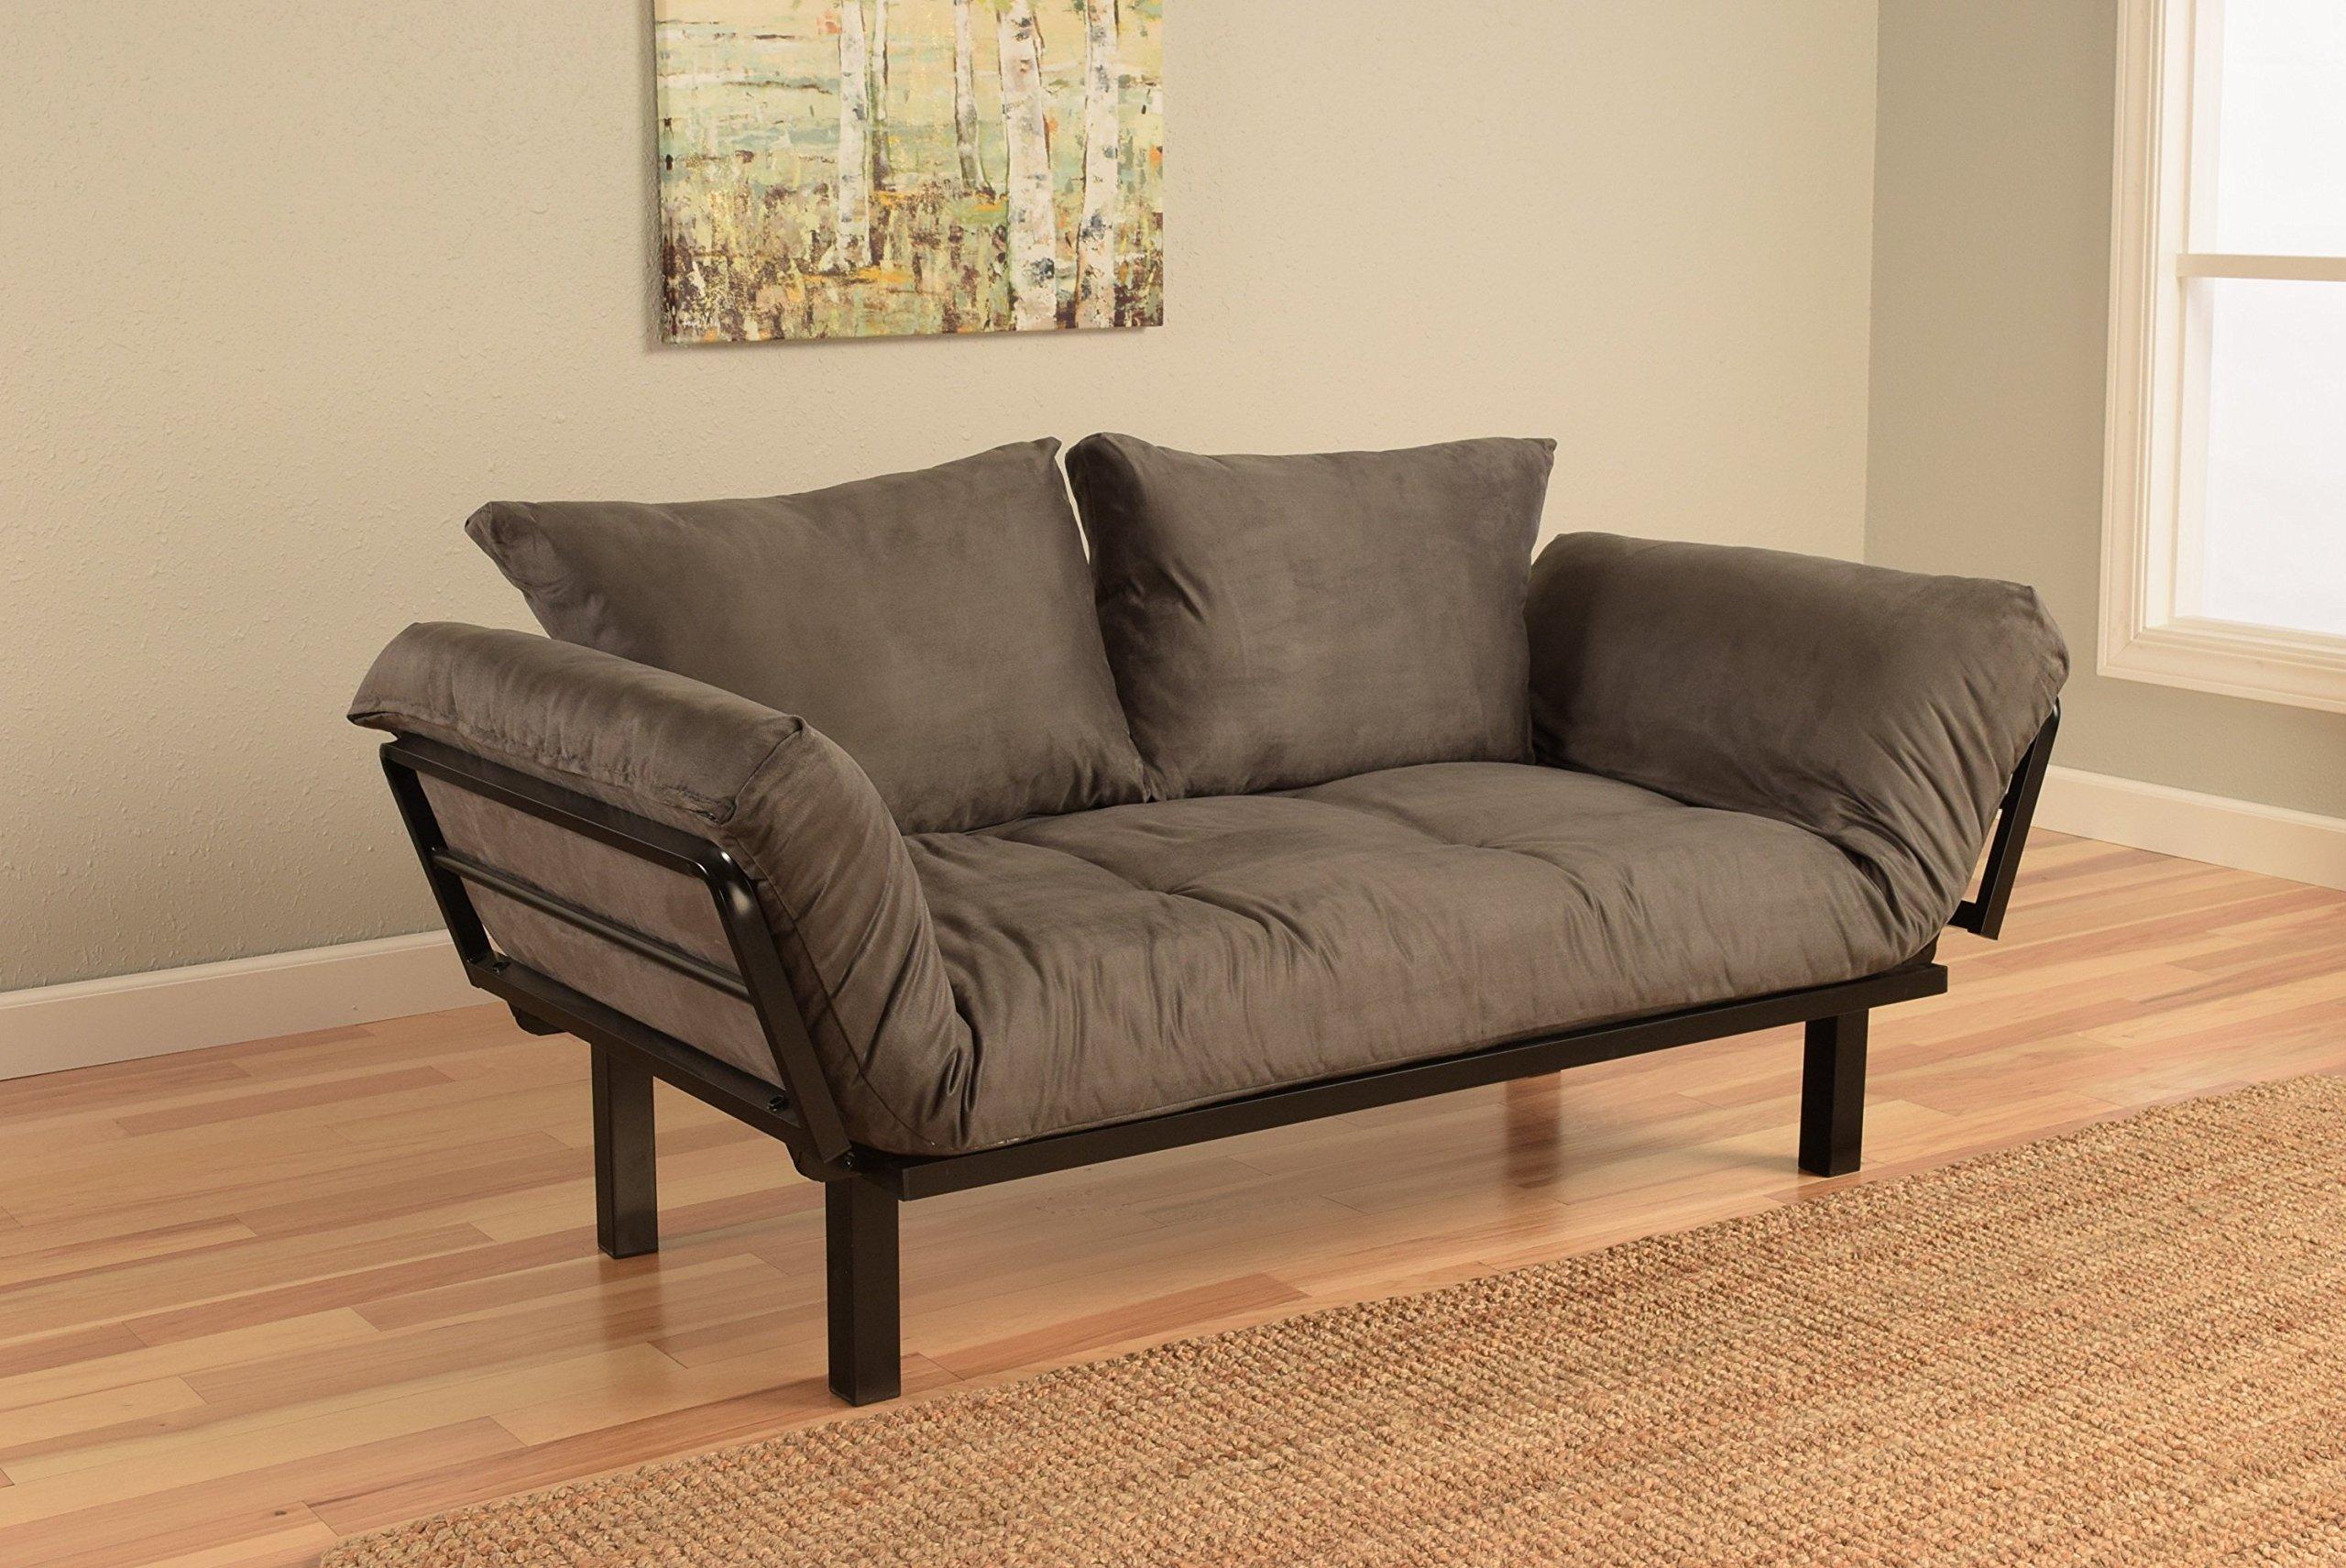 Best Futon Lounger Sit Lounge Sleep